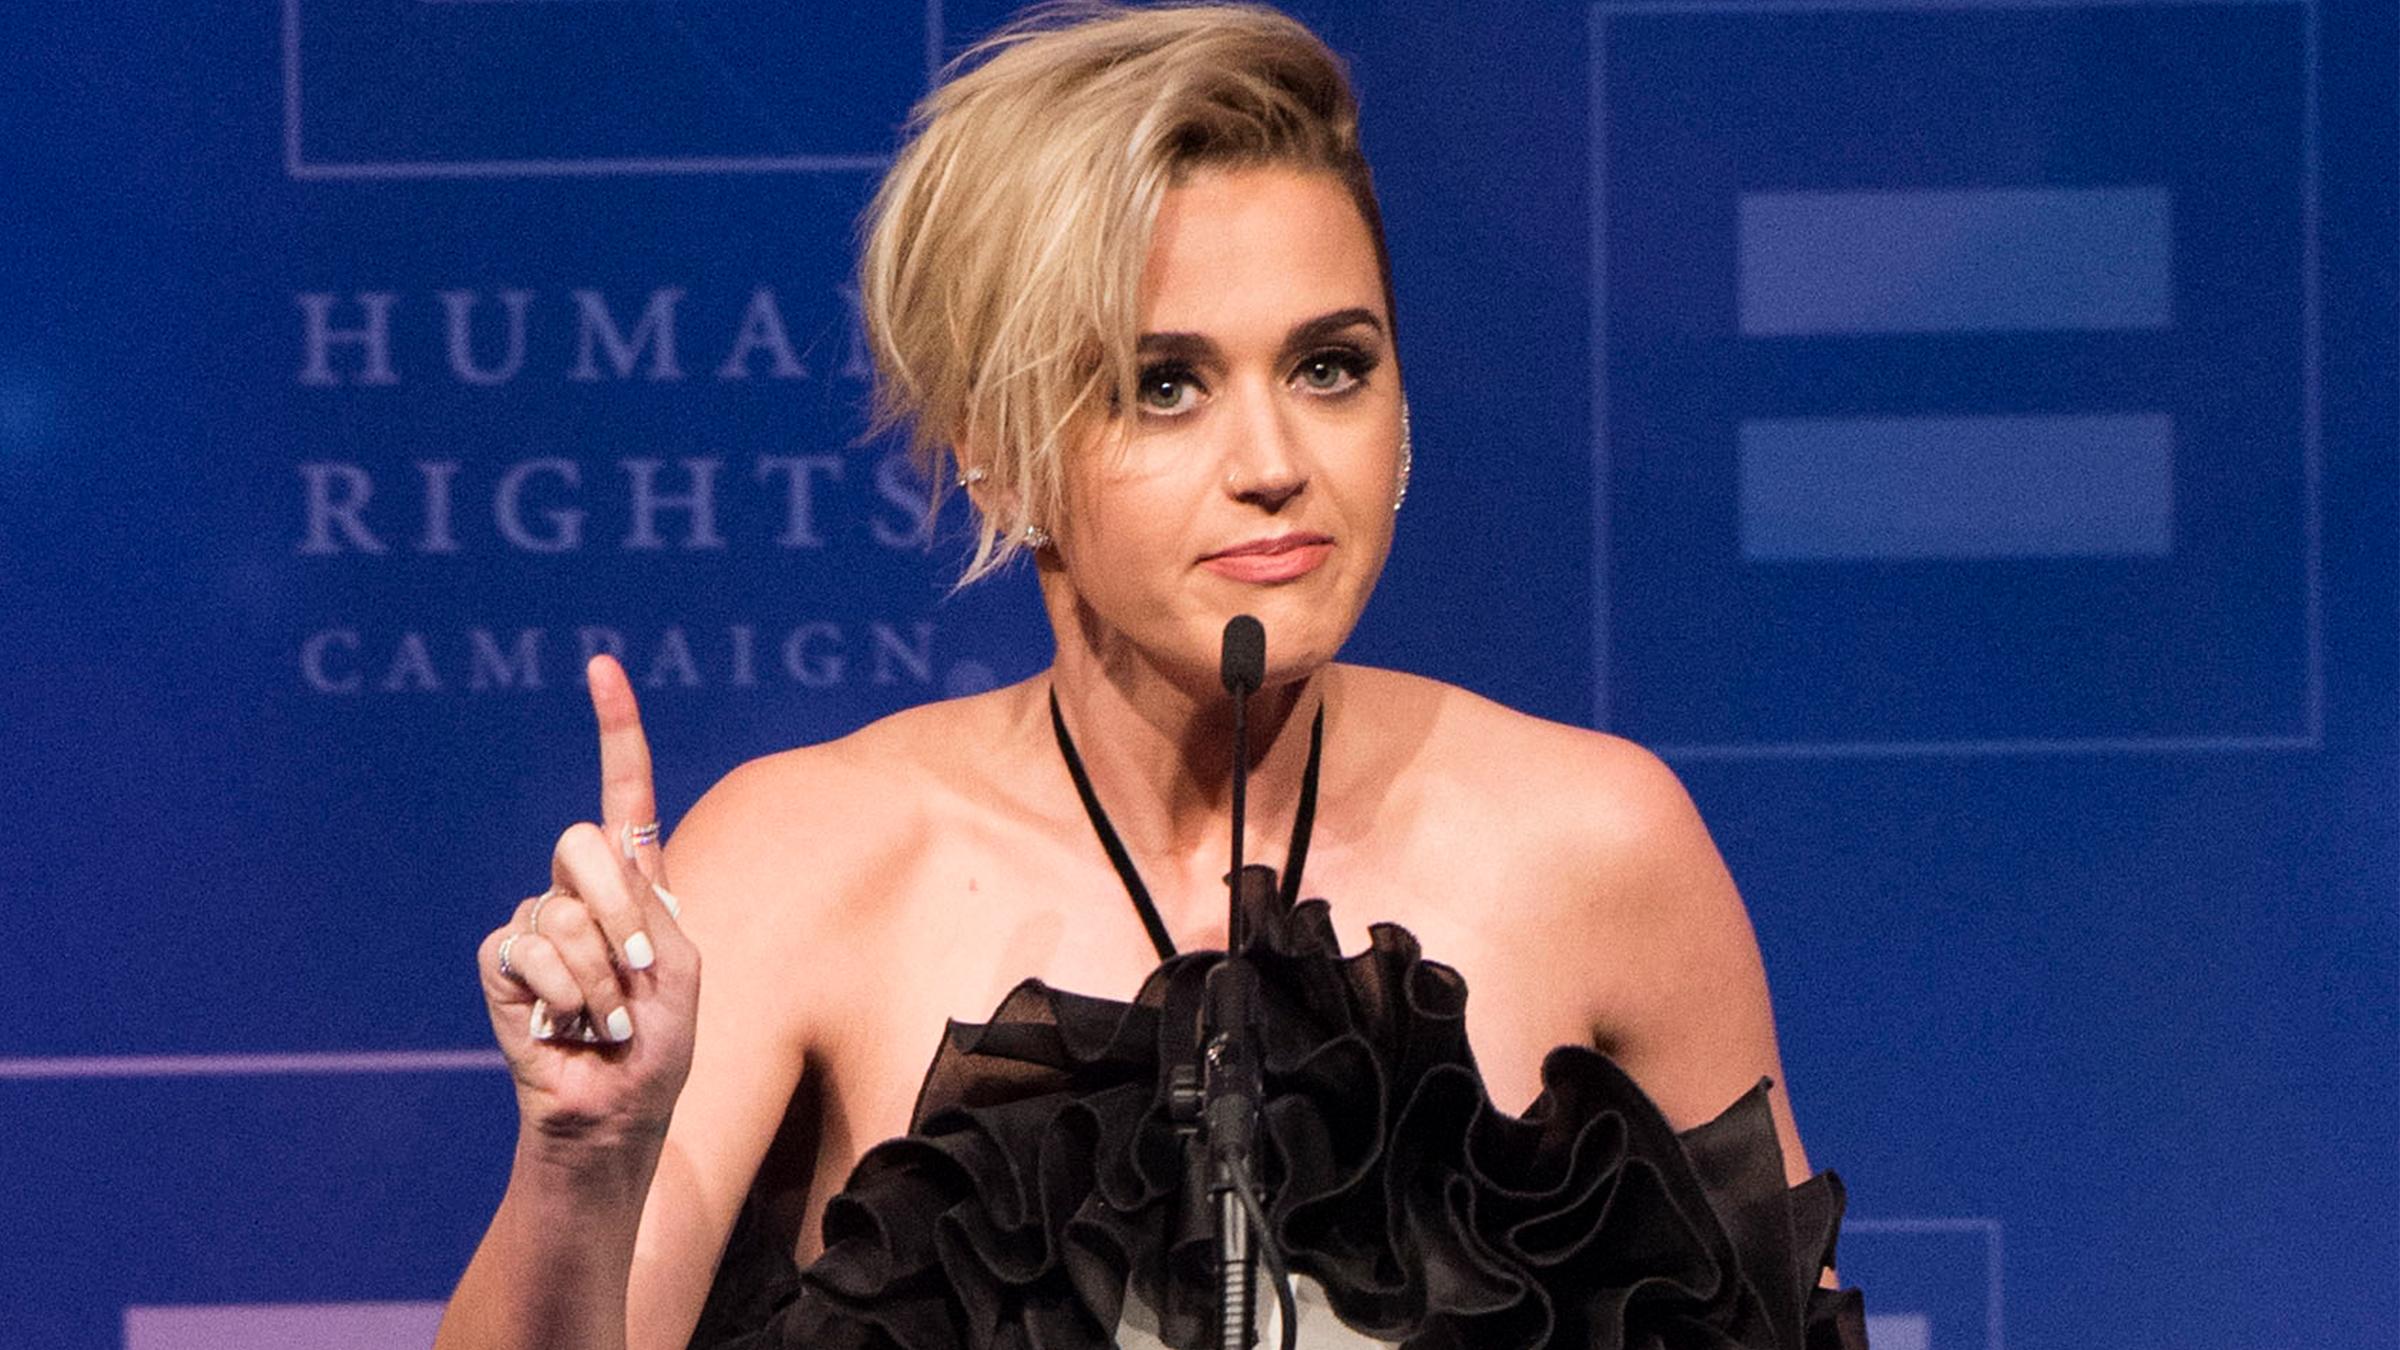 Katy tracklist teaser